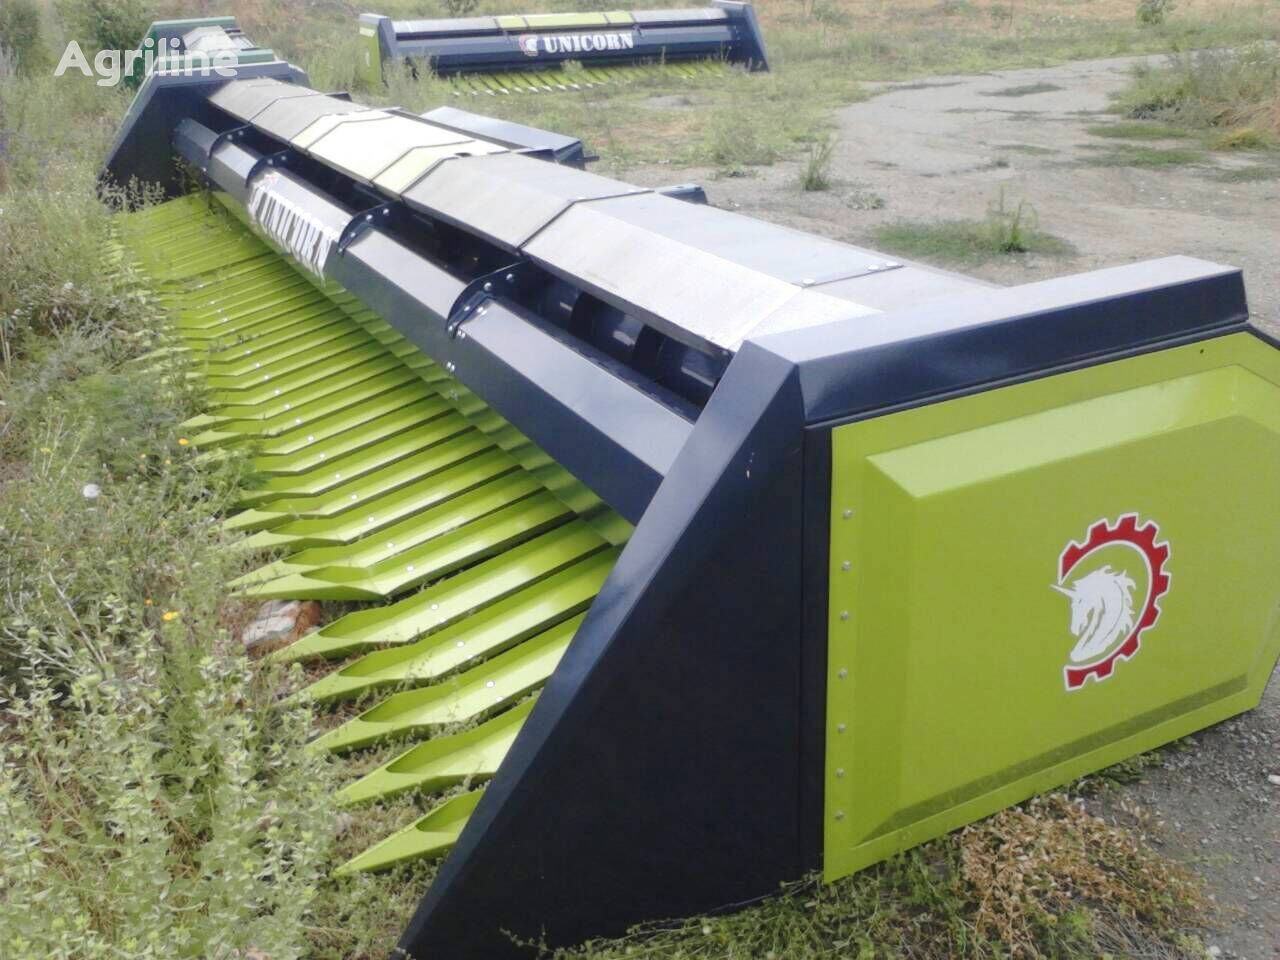 nova CLAAS Yunikorn 6-9 metrov adapter za žetvu suncokreta